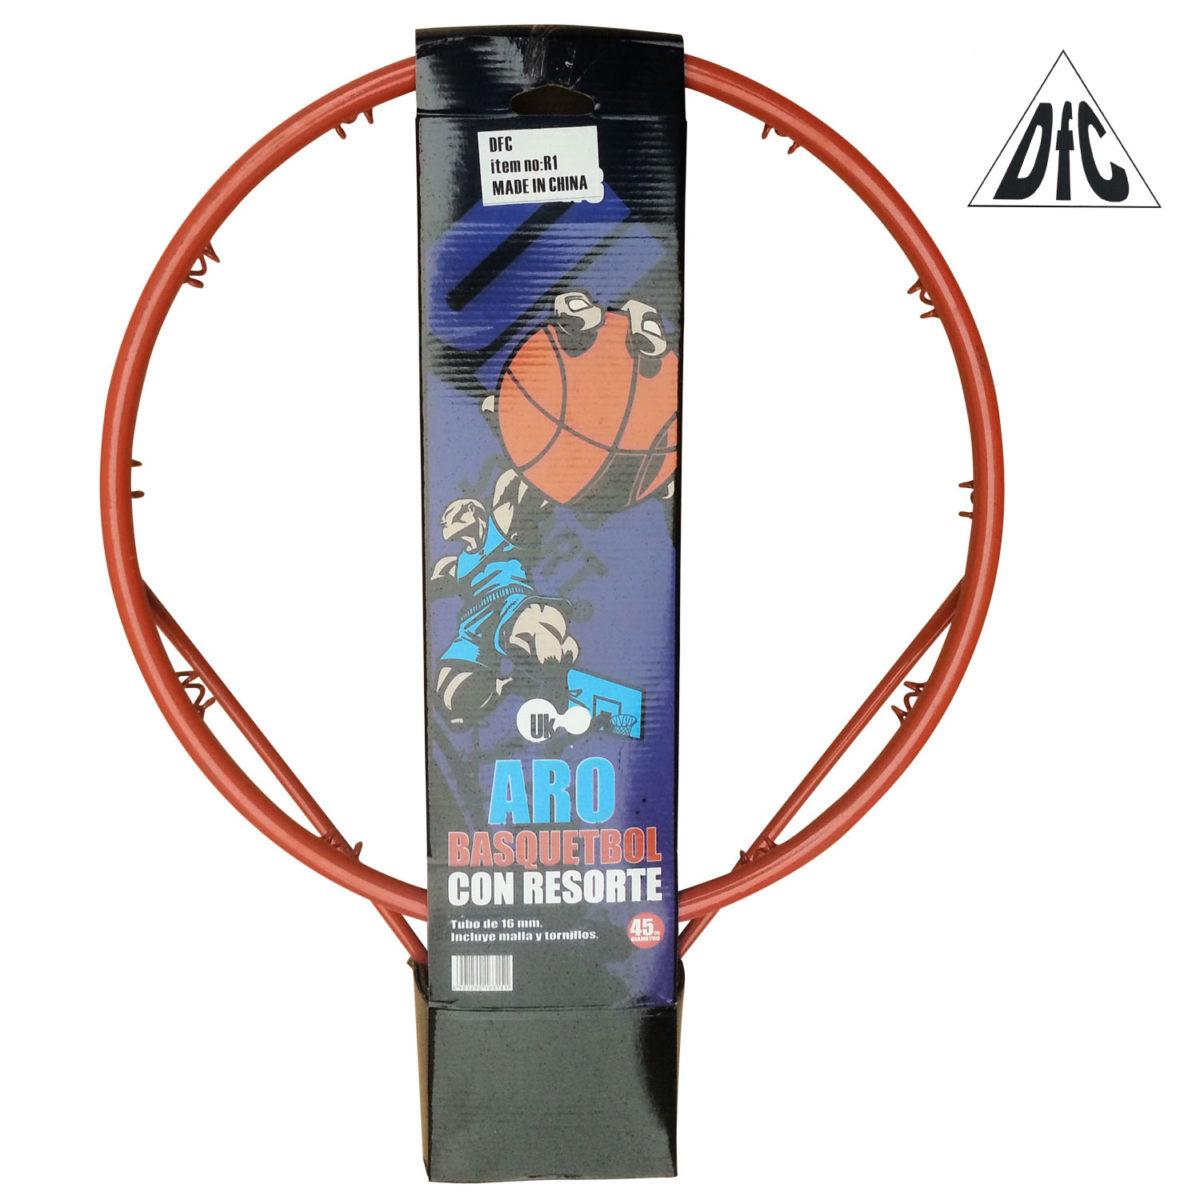 DFC Кольцо баскетбольное 45 см.   R1 - 1